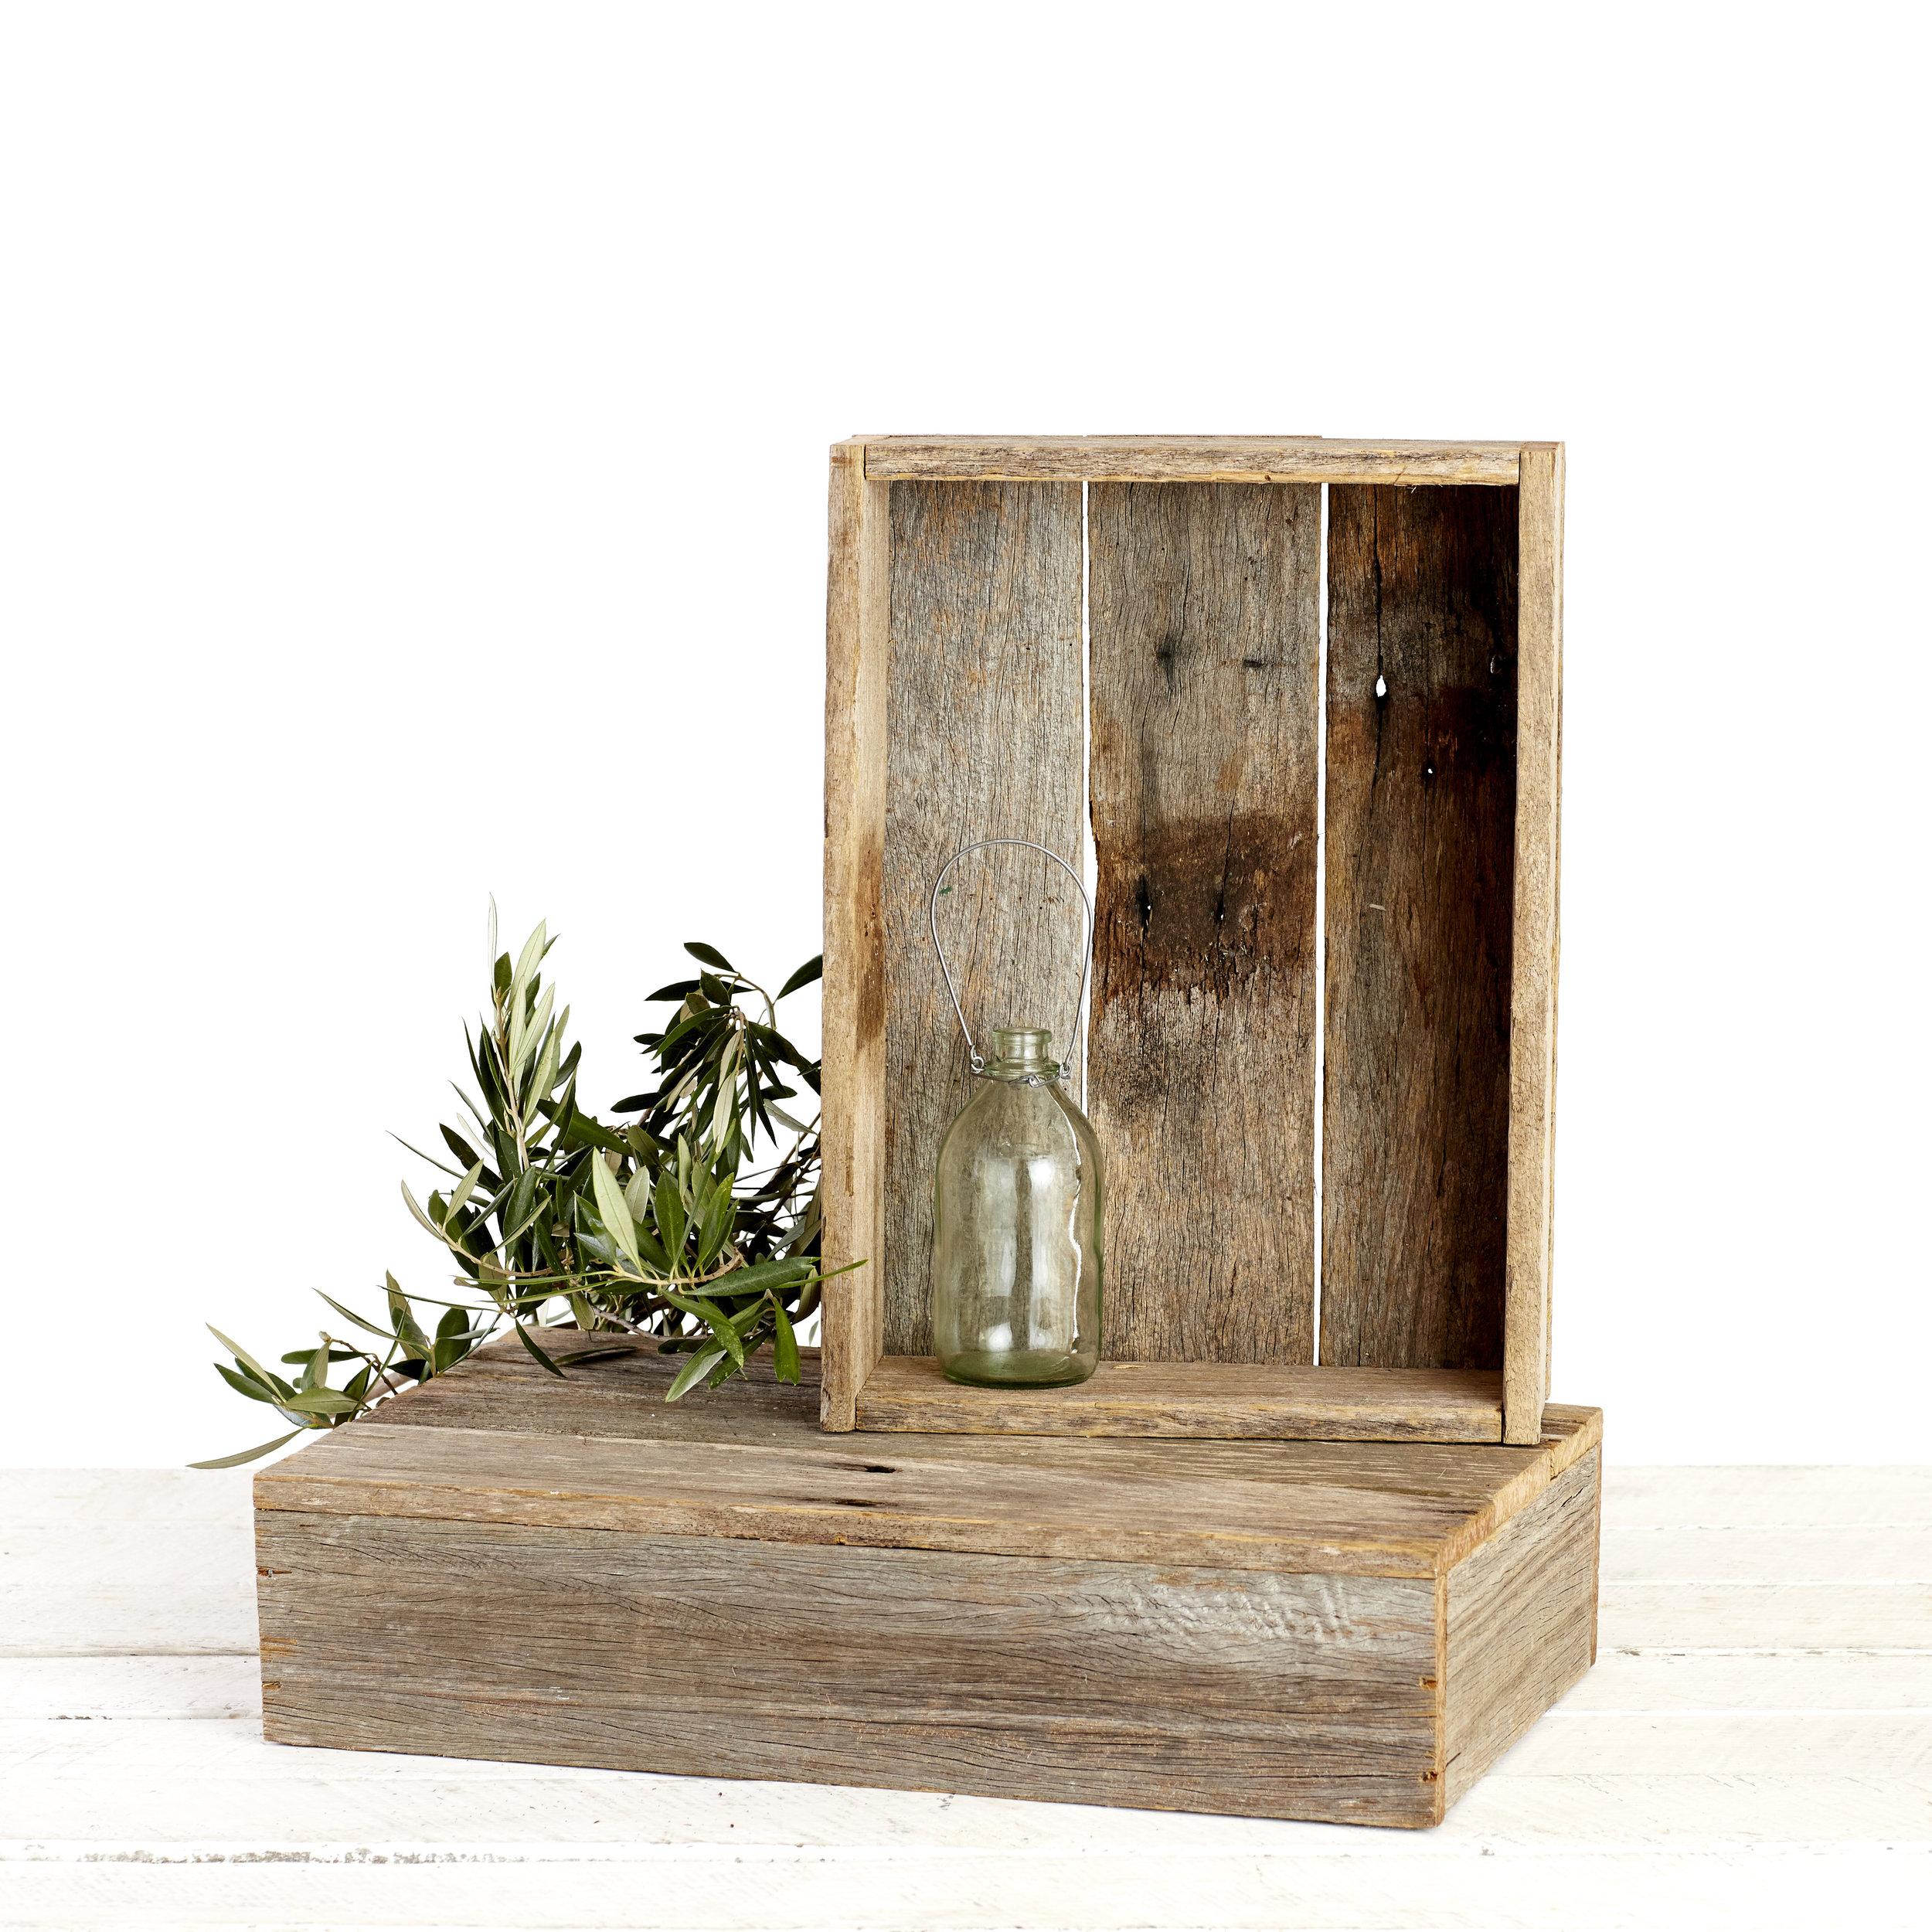 RUSTIC BOXES - BROWN